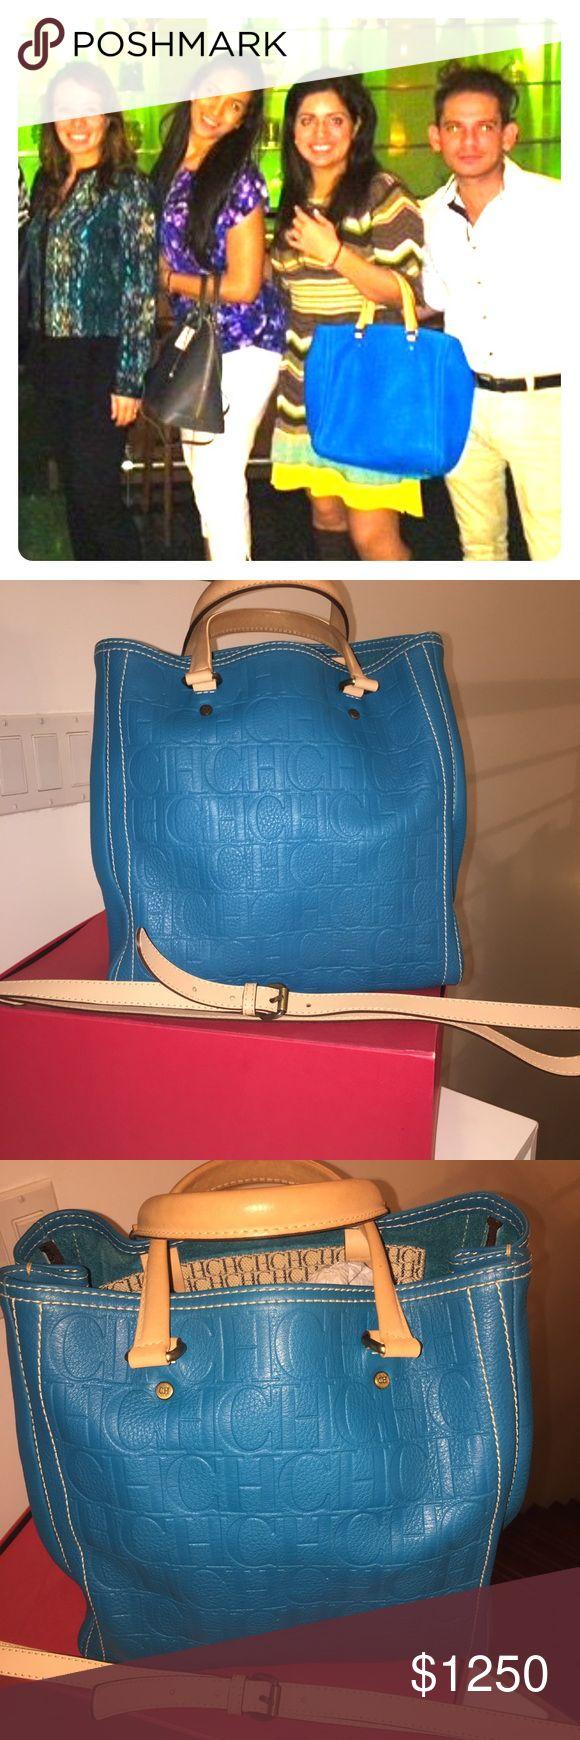 CAROLINA HERRERA TURQUOISE PURSE CAROLINA HERRERA TURQUOISE PURSE Carolina Herrera Bags Shoulder Bags